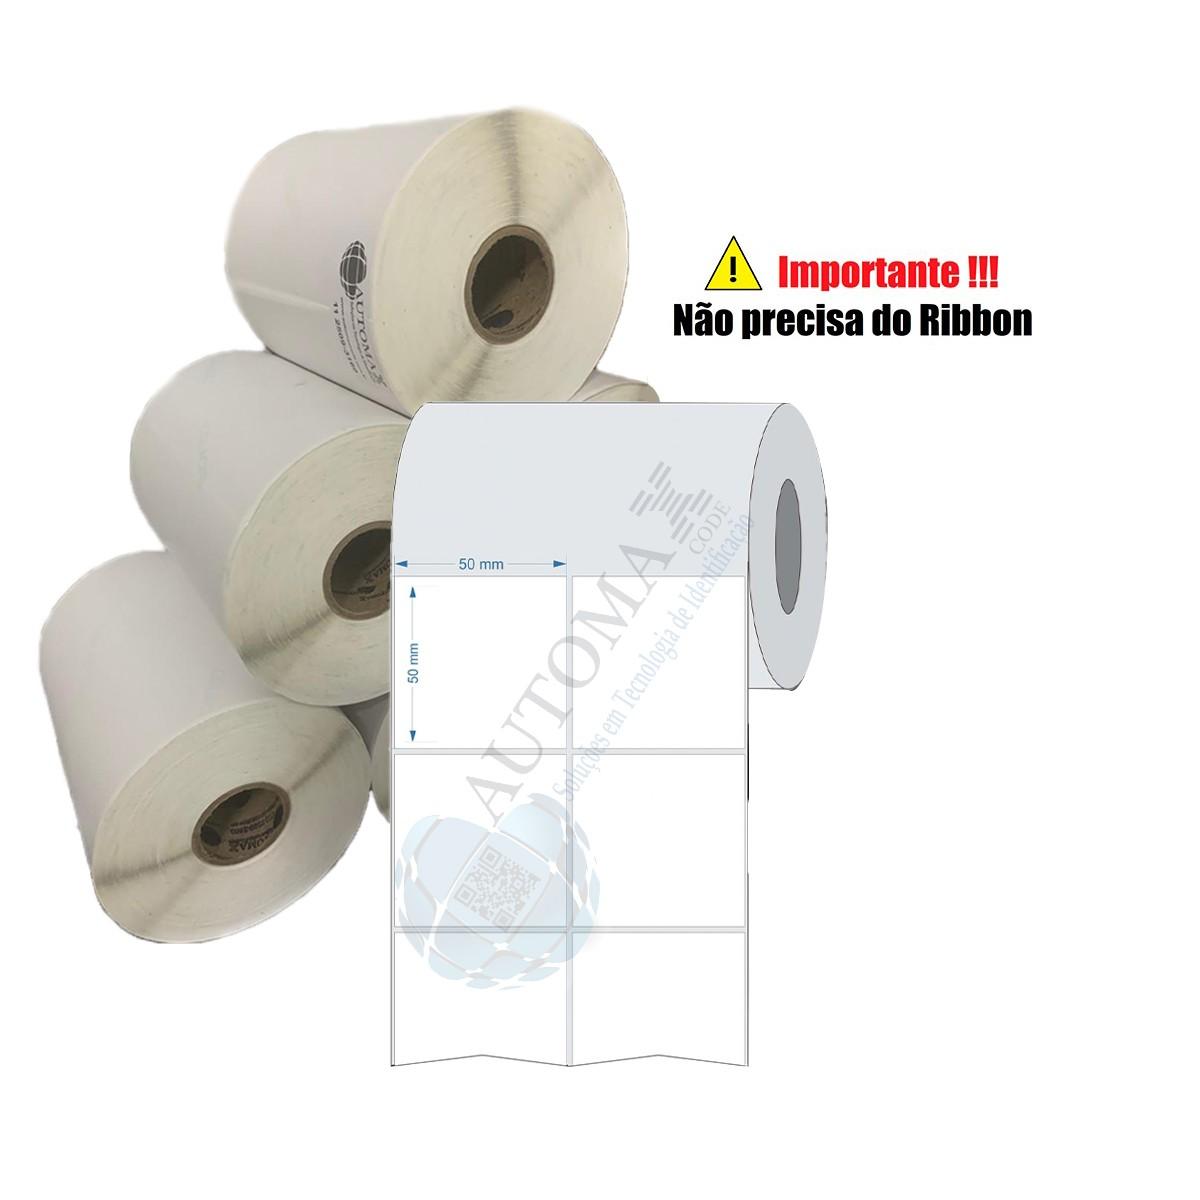 10 Rolos de Etiqueta Térmica 50x50| 50mmX50mm 2 Colunas